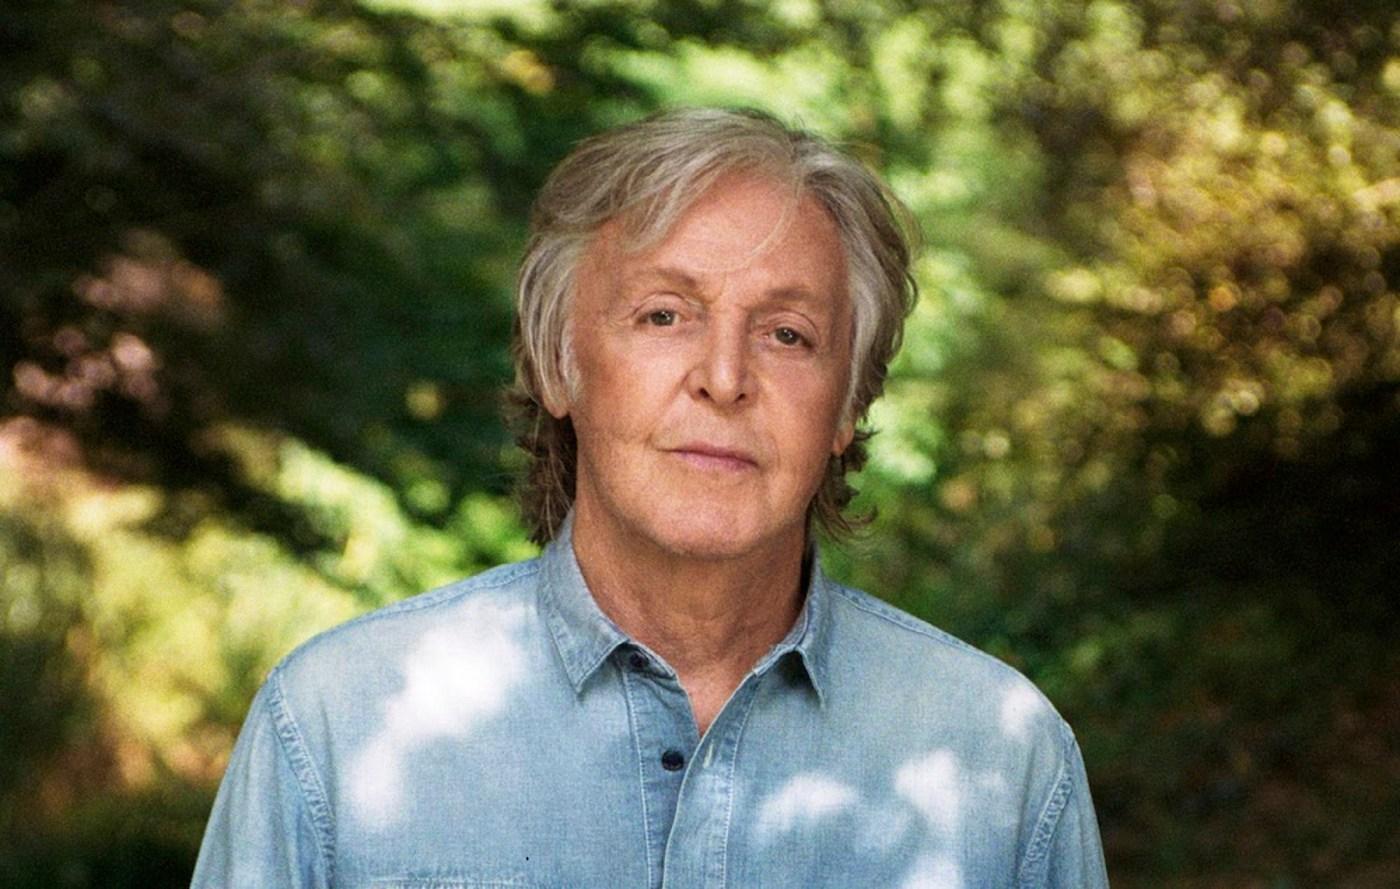 Paul McCartney Documentary, Law & Order: SVU